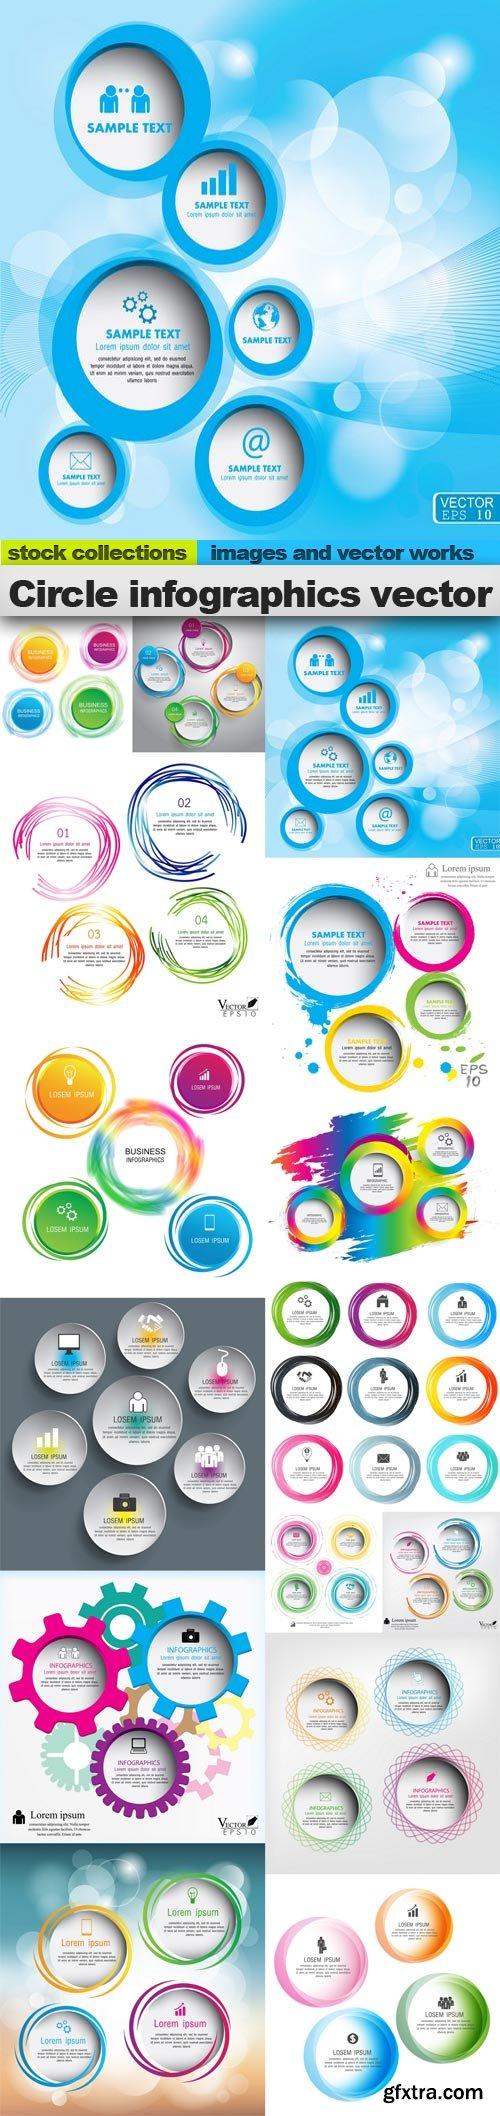 Circle infographics vector, 15 x EPS